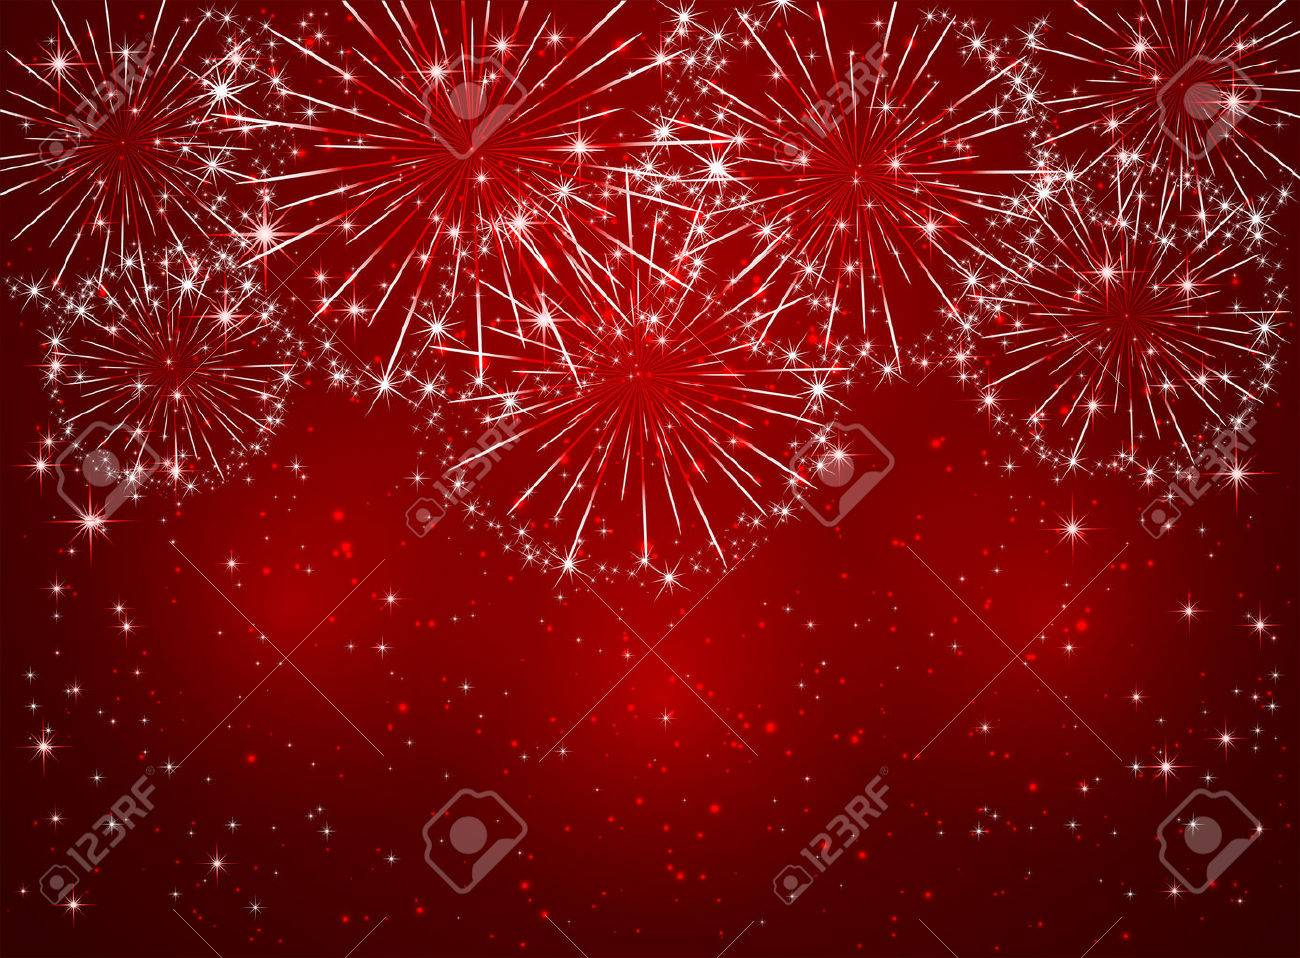 Bright sparkling fireworks on red shiny background, illustration. - 50331169